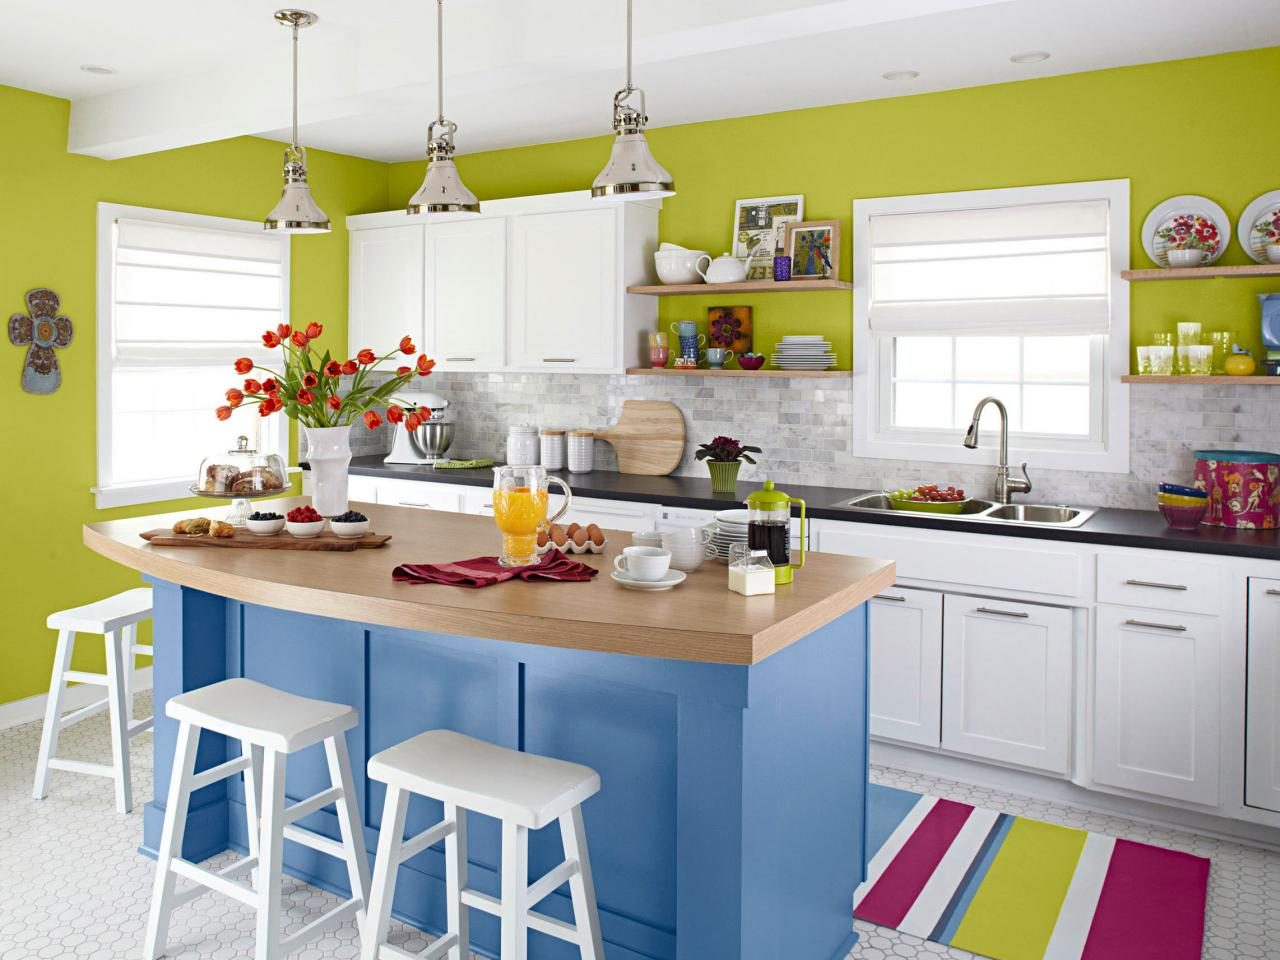 Fullsize Of Kitchen Island Design